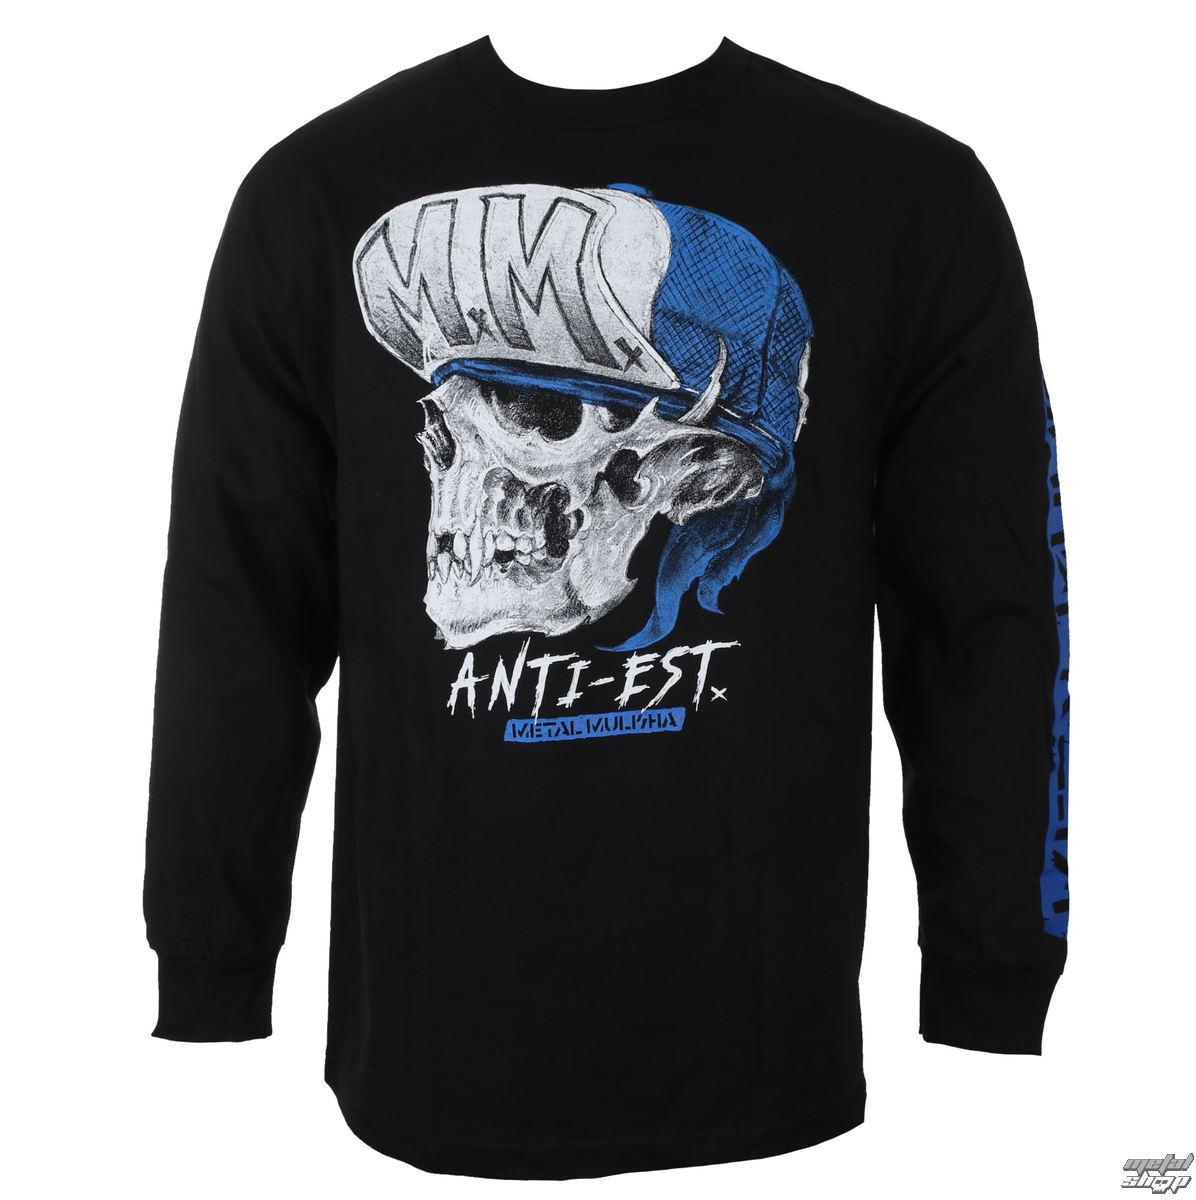 tričko pánske s dlhým rukávom METAL MULISHA - ANTI - BLK_FA7519007.01